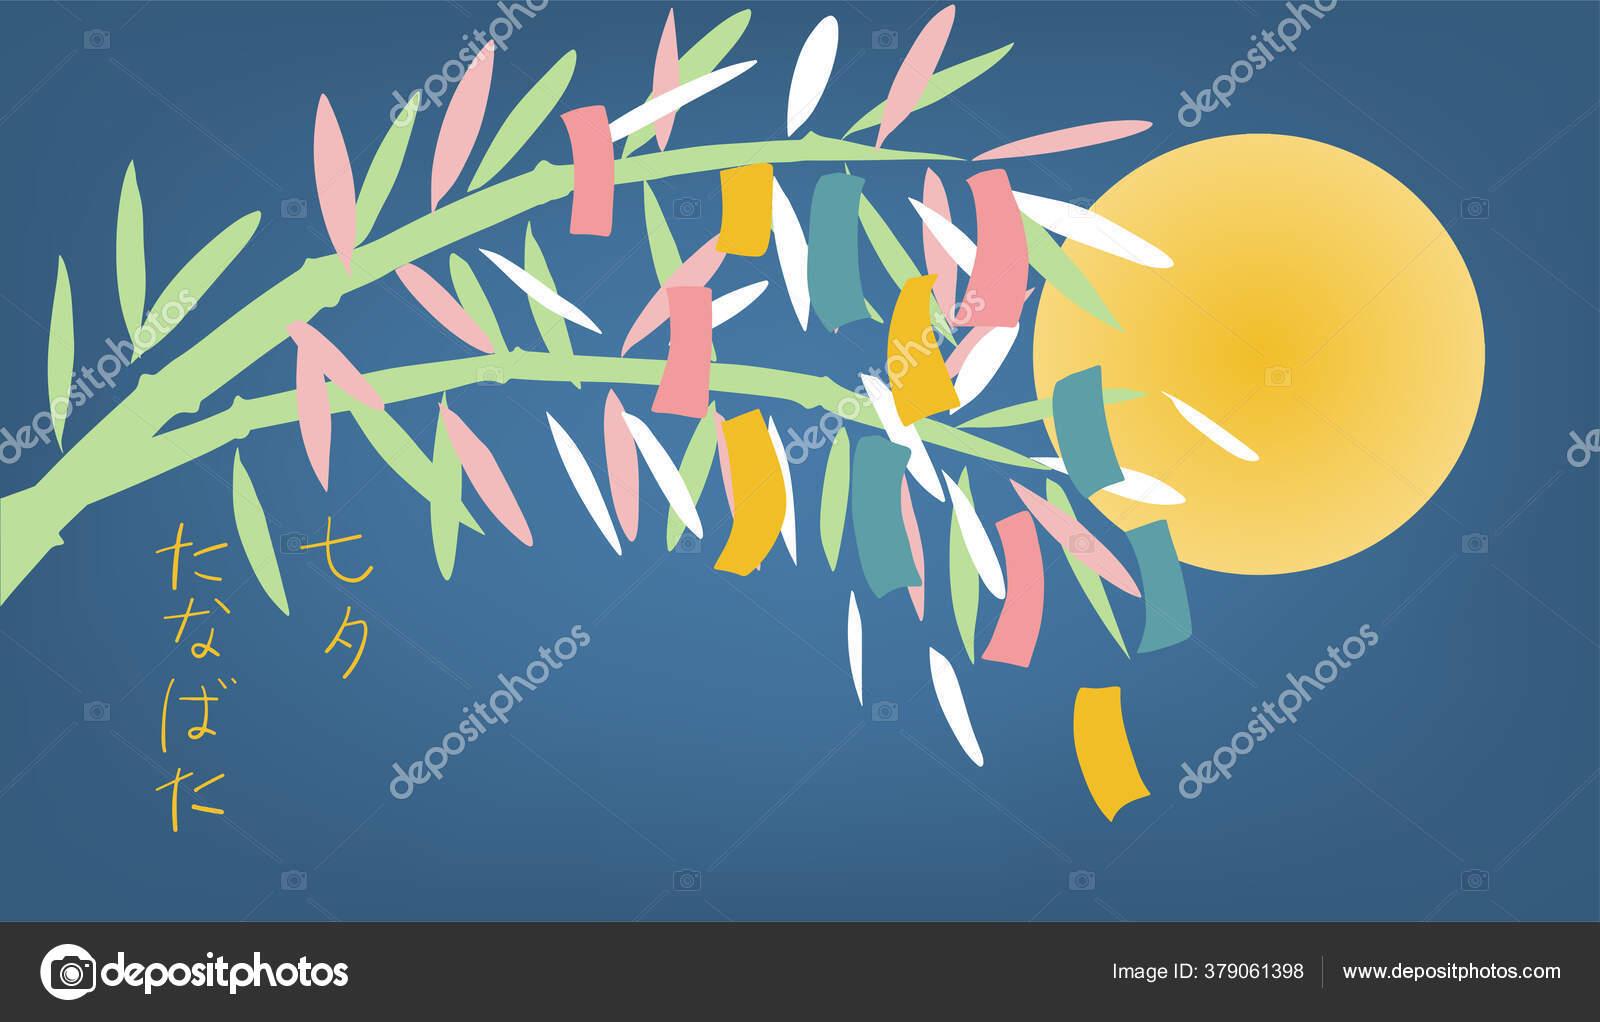 vektor ilustrasi untuk tanabata atau bintang festival jepang cabang bambu stok vektor c stournsaeh 379061398 https id depositphotos com 379061398 stock illustration vector illustration tanabata japanese star html